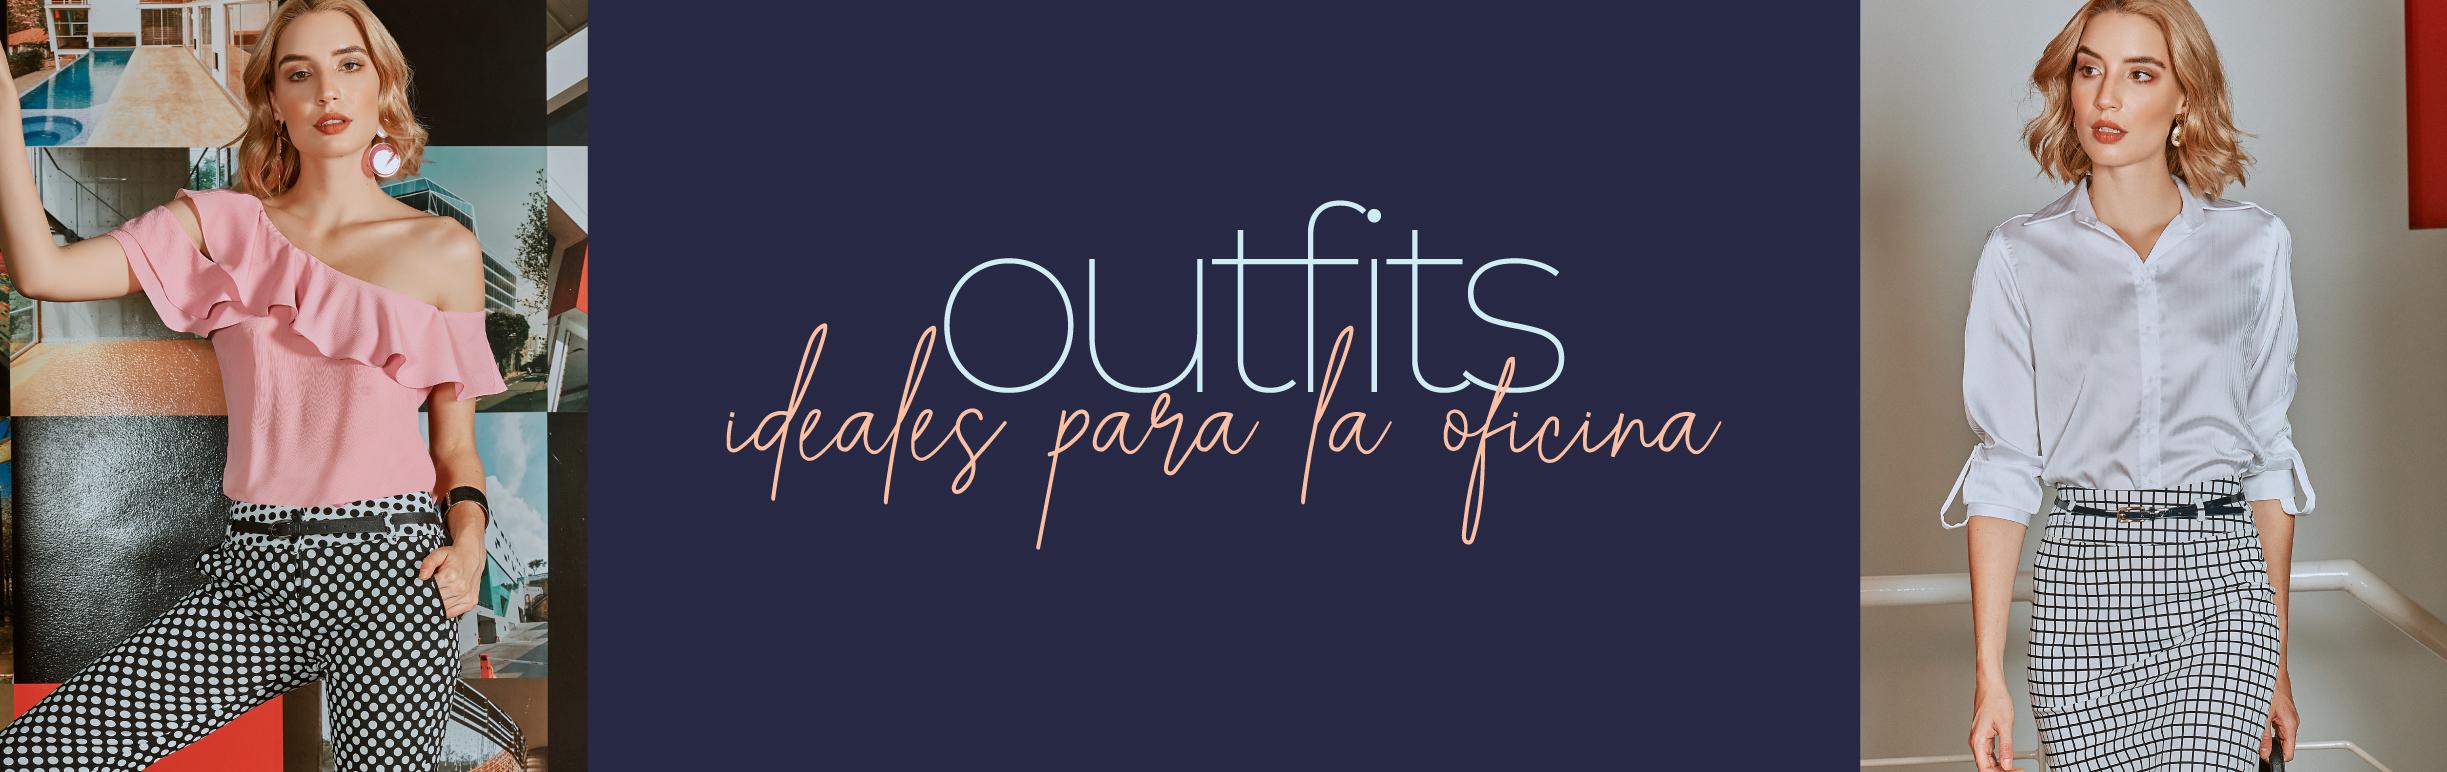 Banner-blog-outfits-trabajo-1.jpg